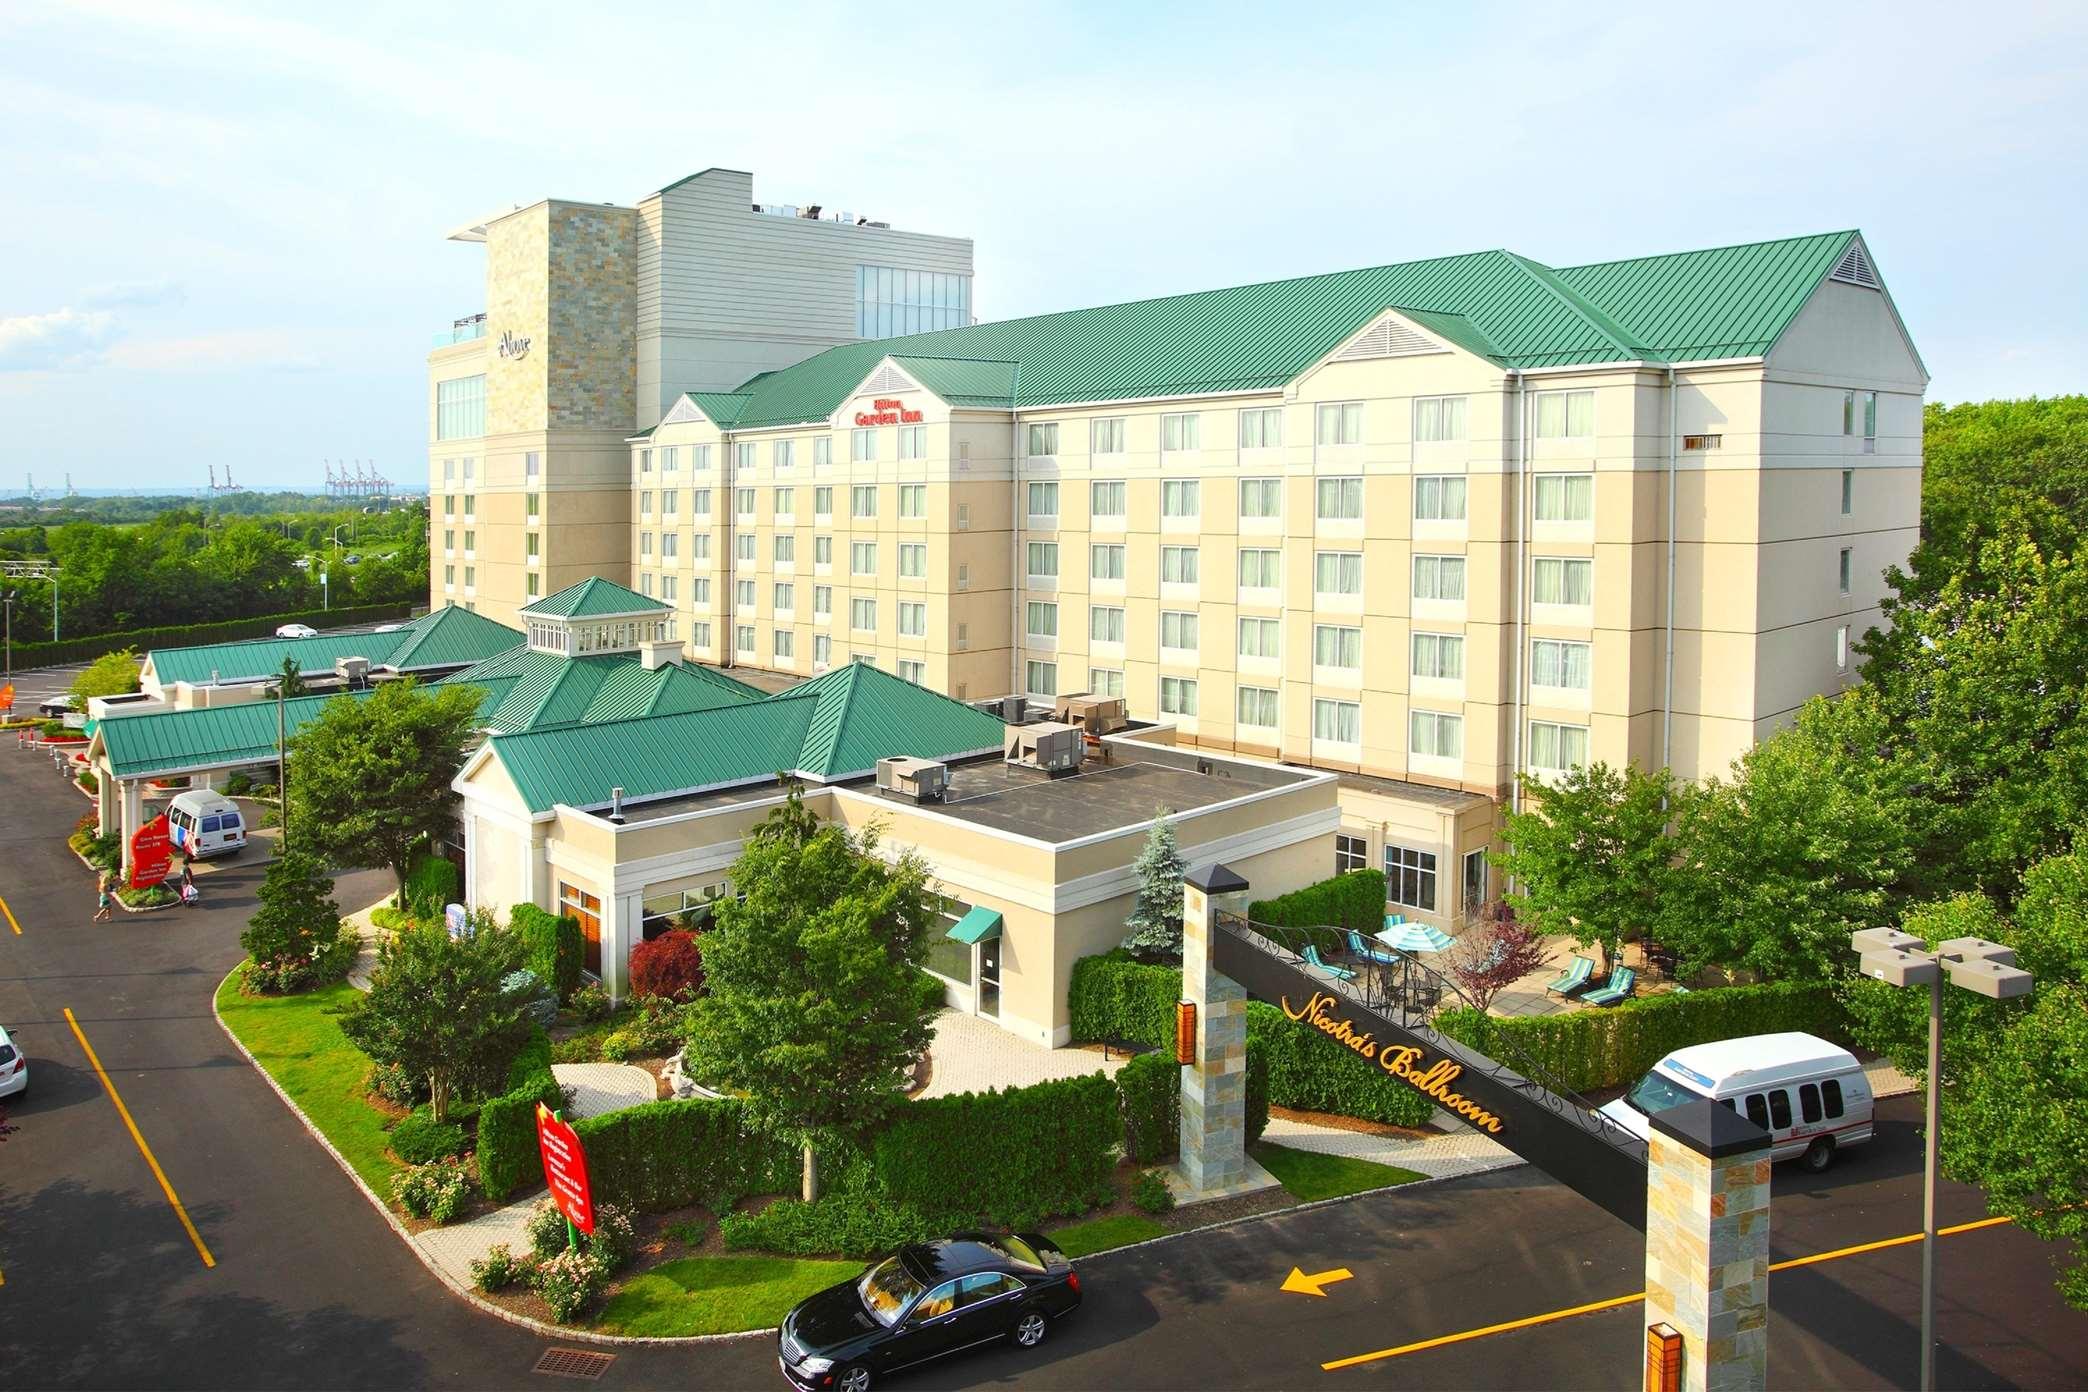 Welcome to Hilton Garden Inn New YorkStaten Island